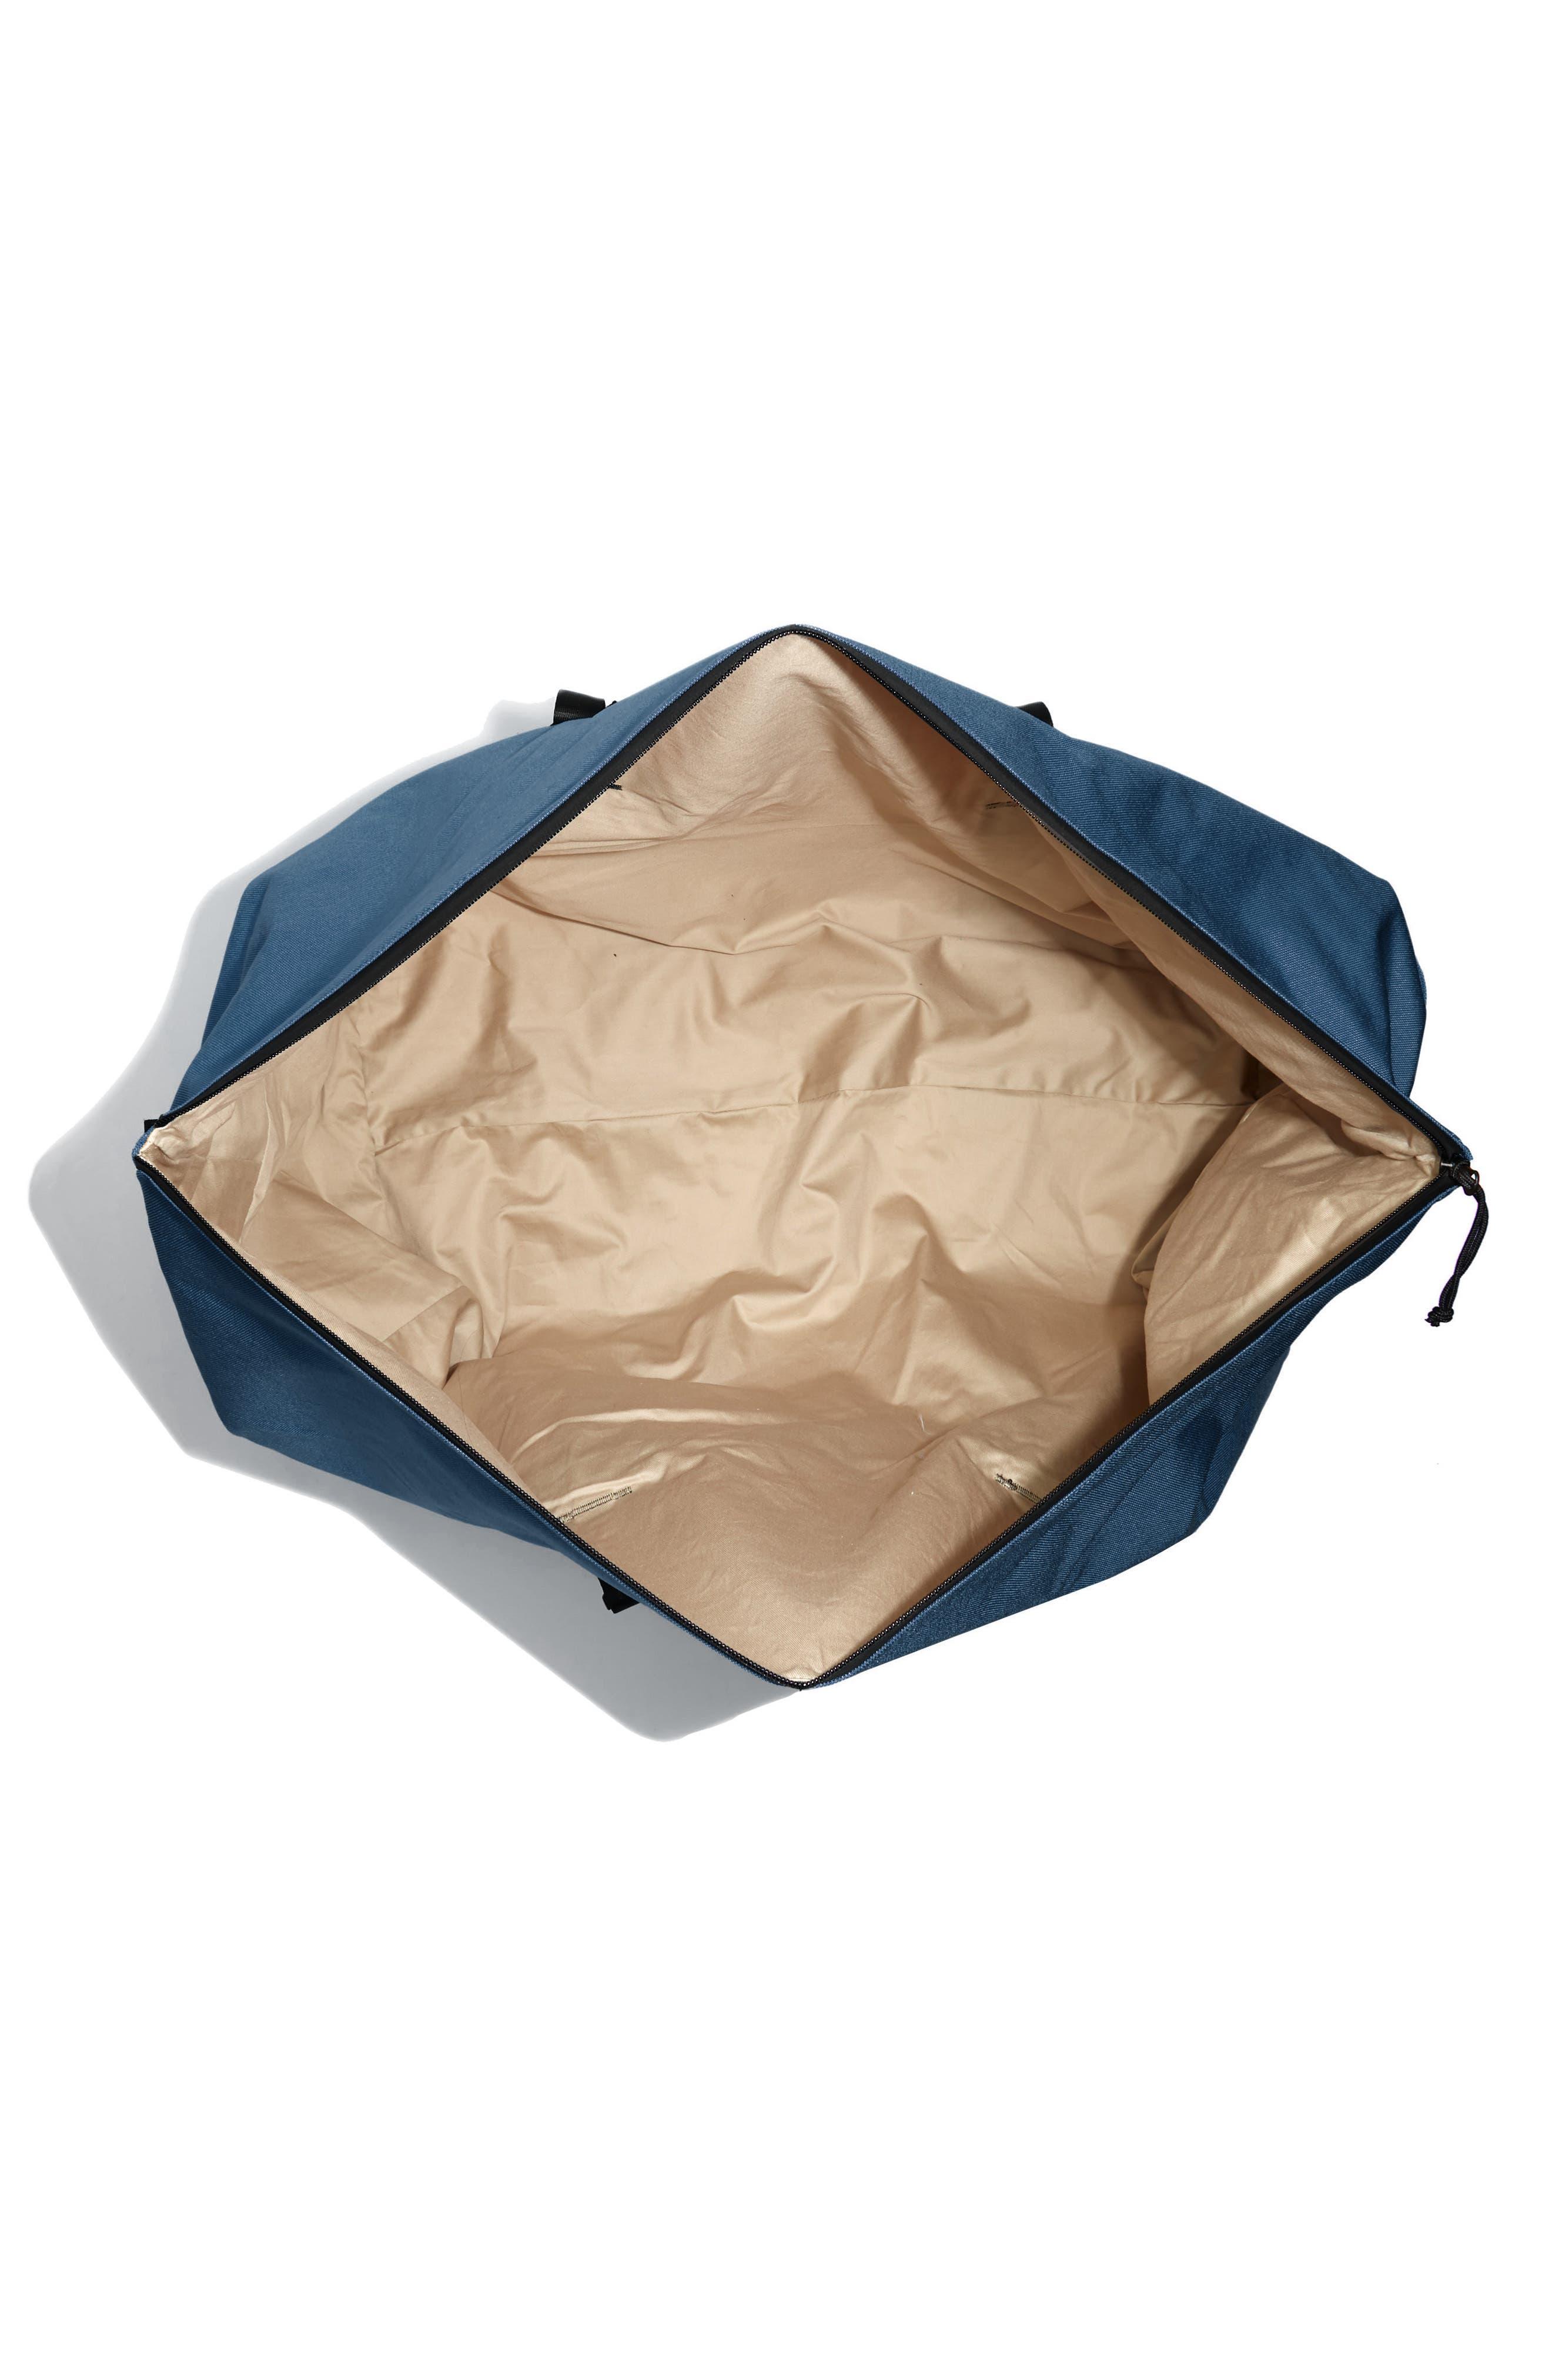 SWS 100L Roll Top Duffel Bag,                             Alternate thumbnail 3, color,                             NAVY